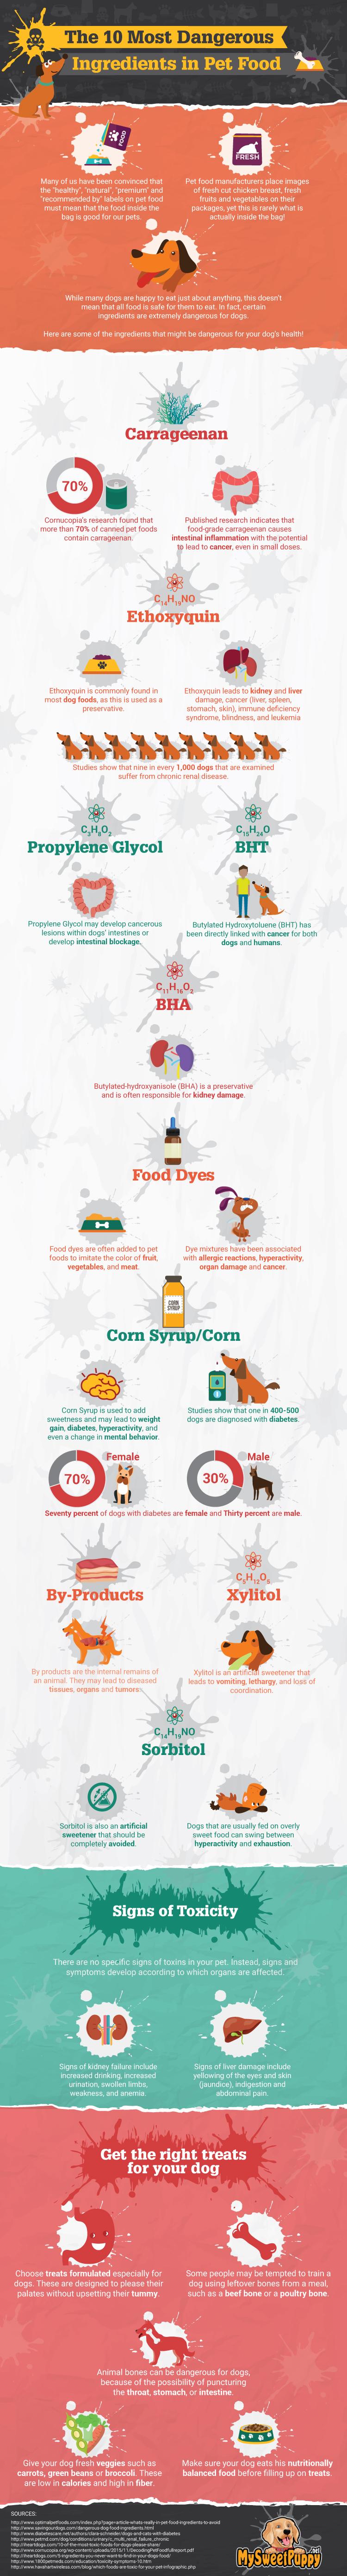 bad-pet-food-ingredients-full-size